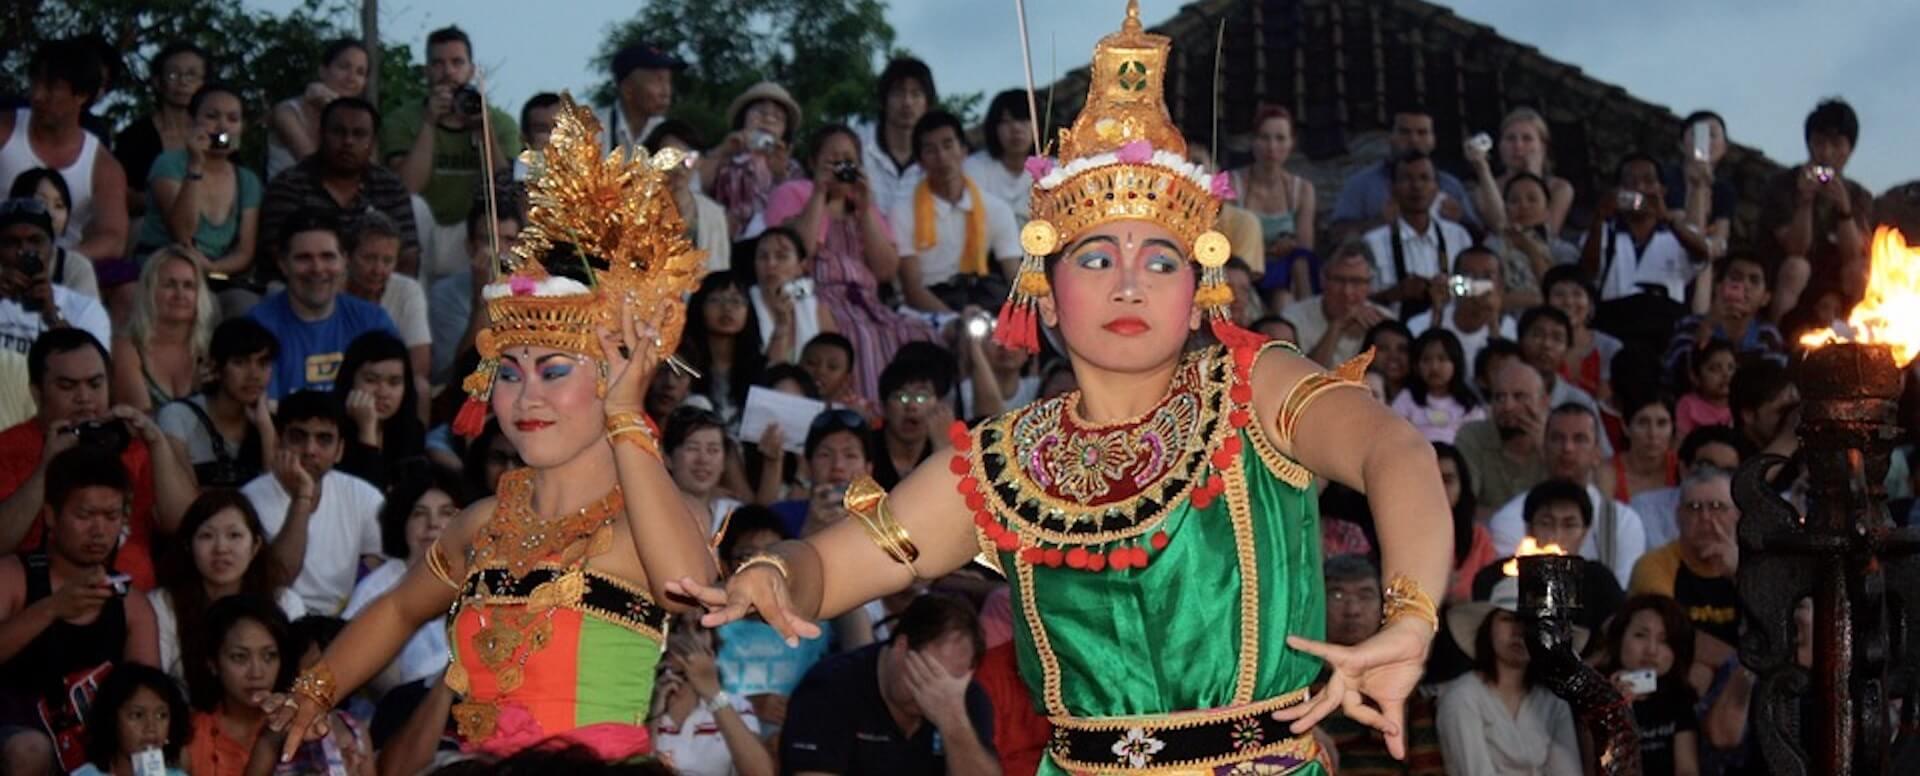 Participate in traditional festivals - Indonesia